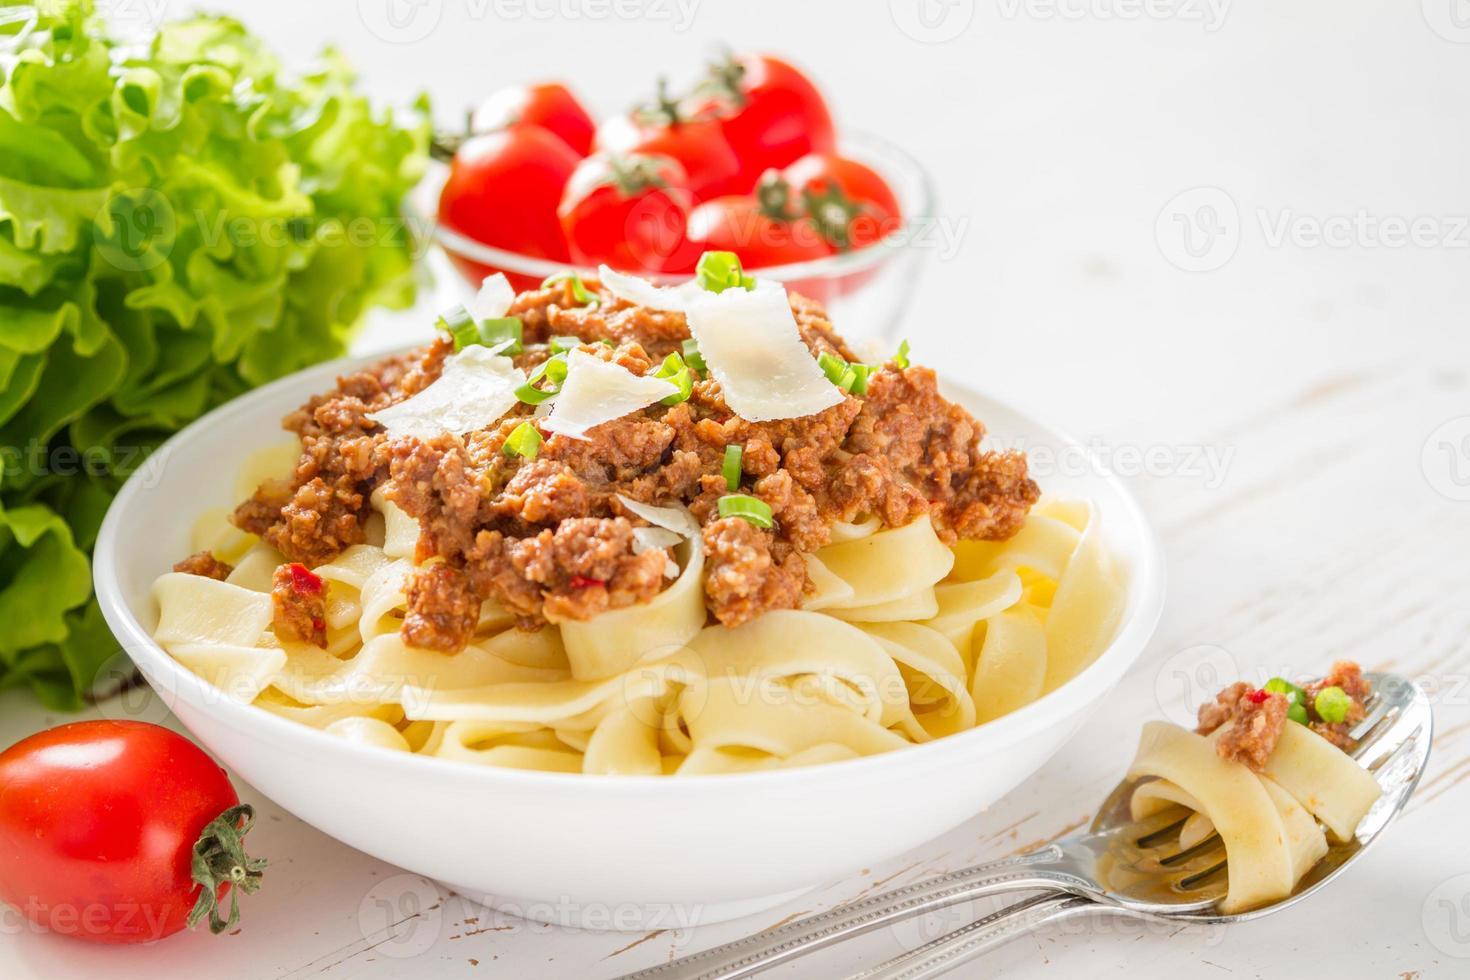 pasta bolognese in witte kom met salade en tomaten foto